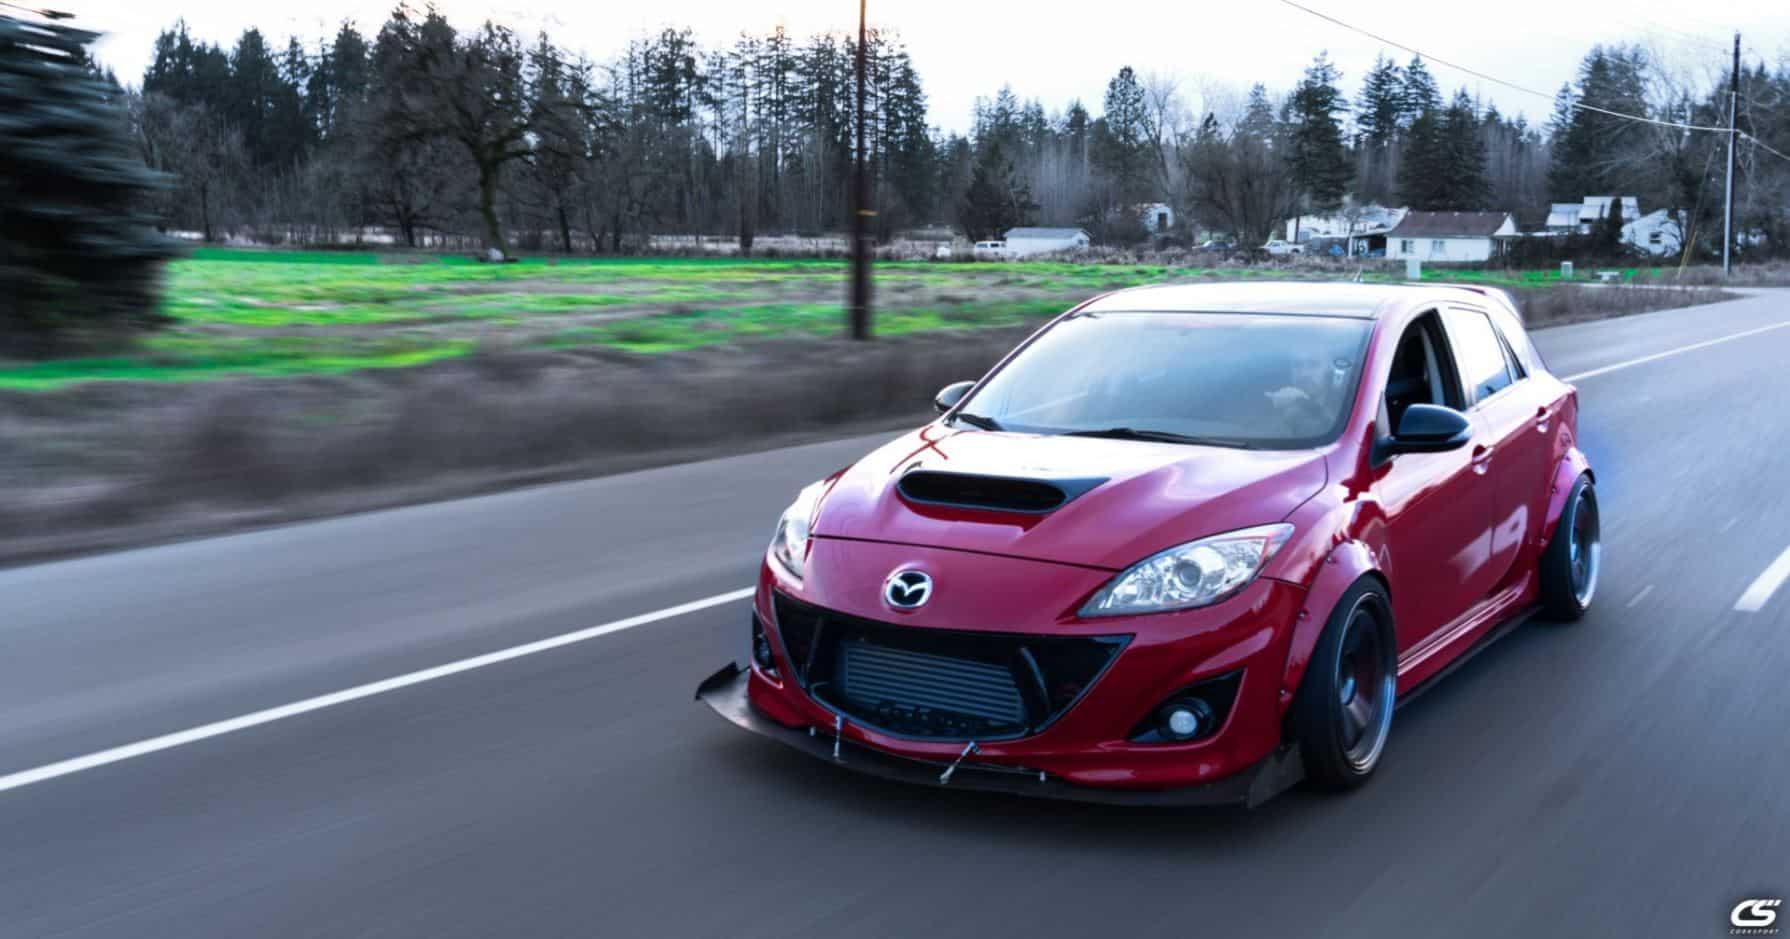 Mazdaspeed3 Build part 2 | CorkSport Mazda Performance Blog